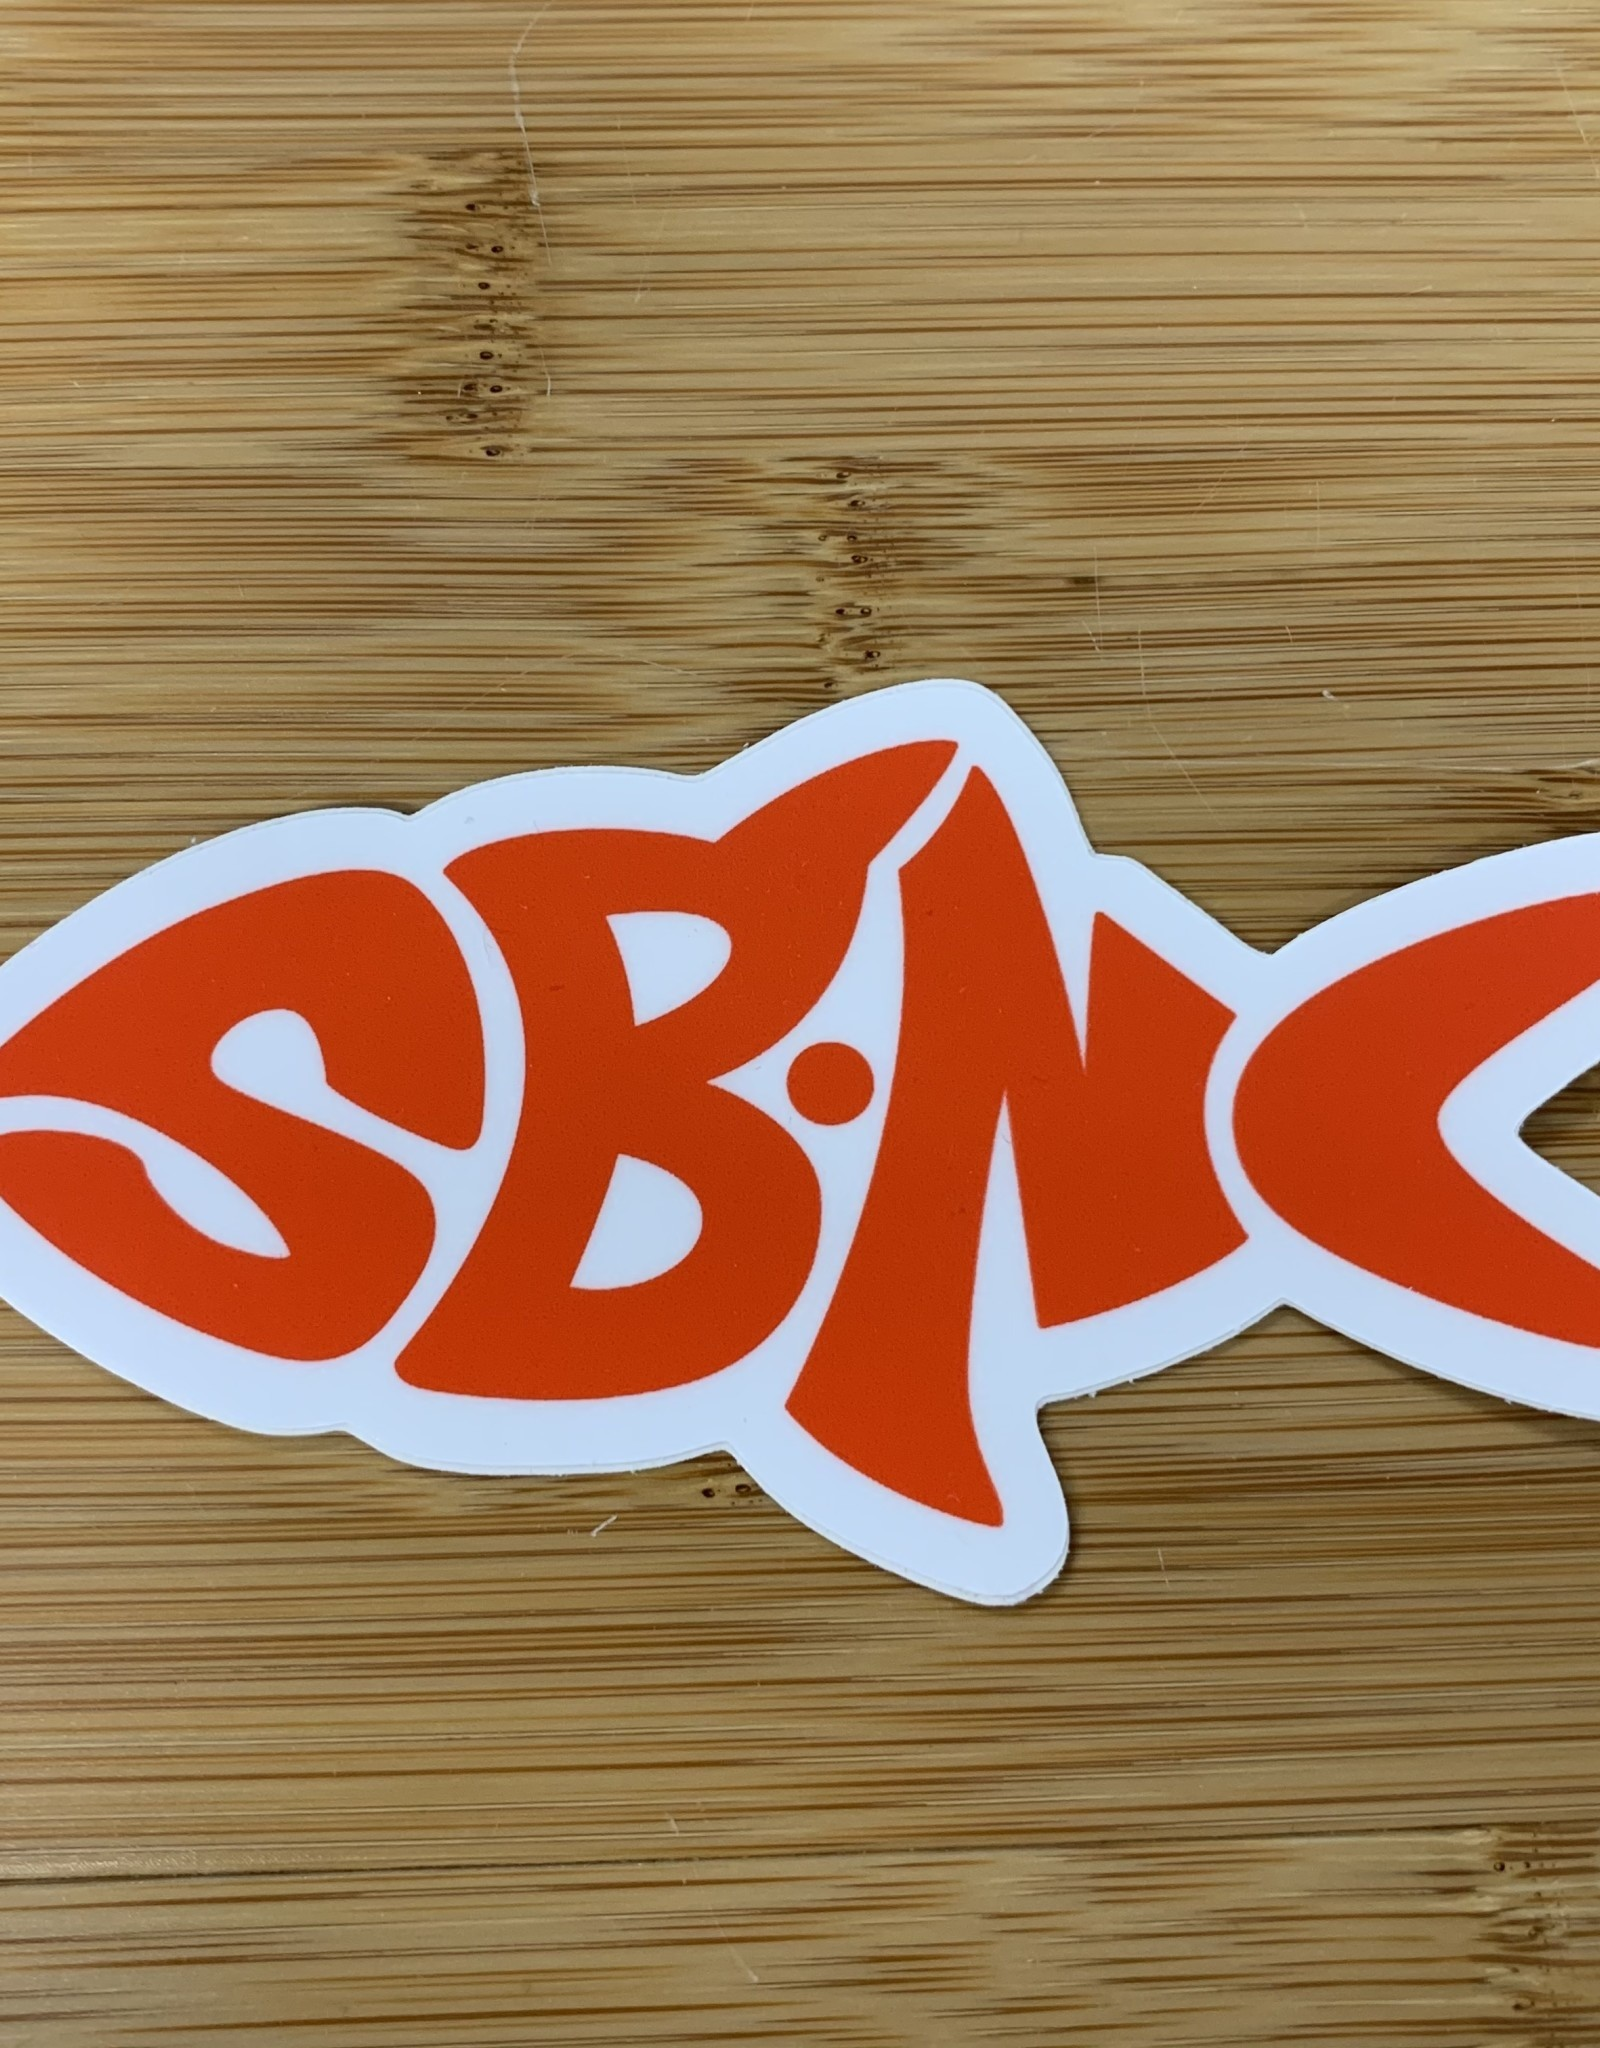 sbncfish STICKER (L) SBNC FISH RED